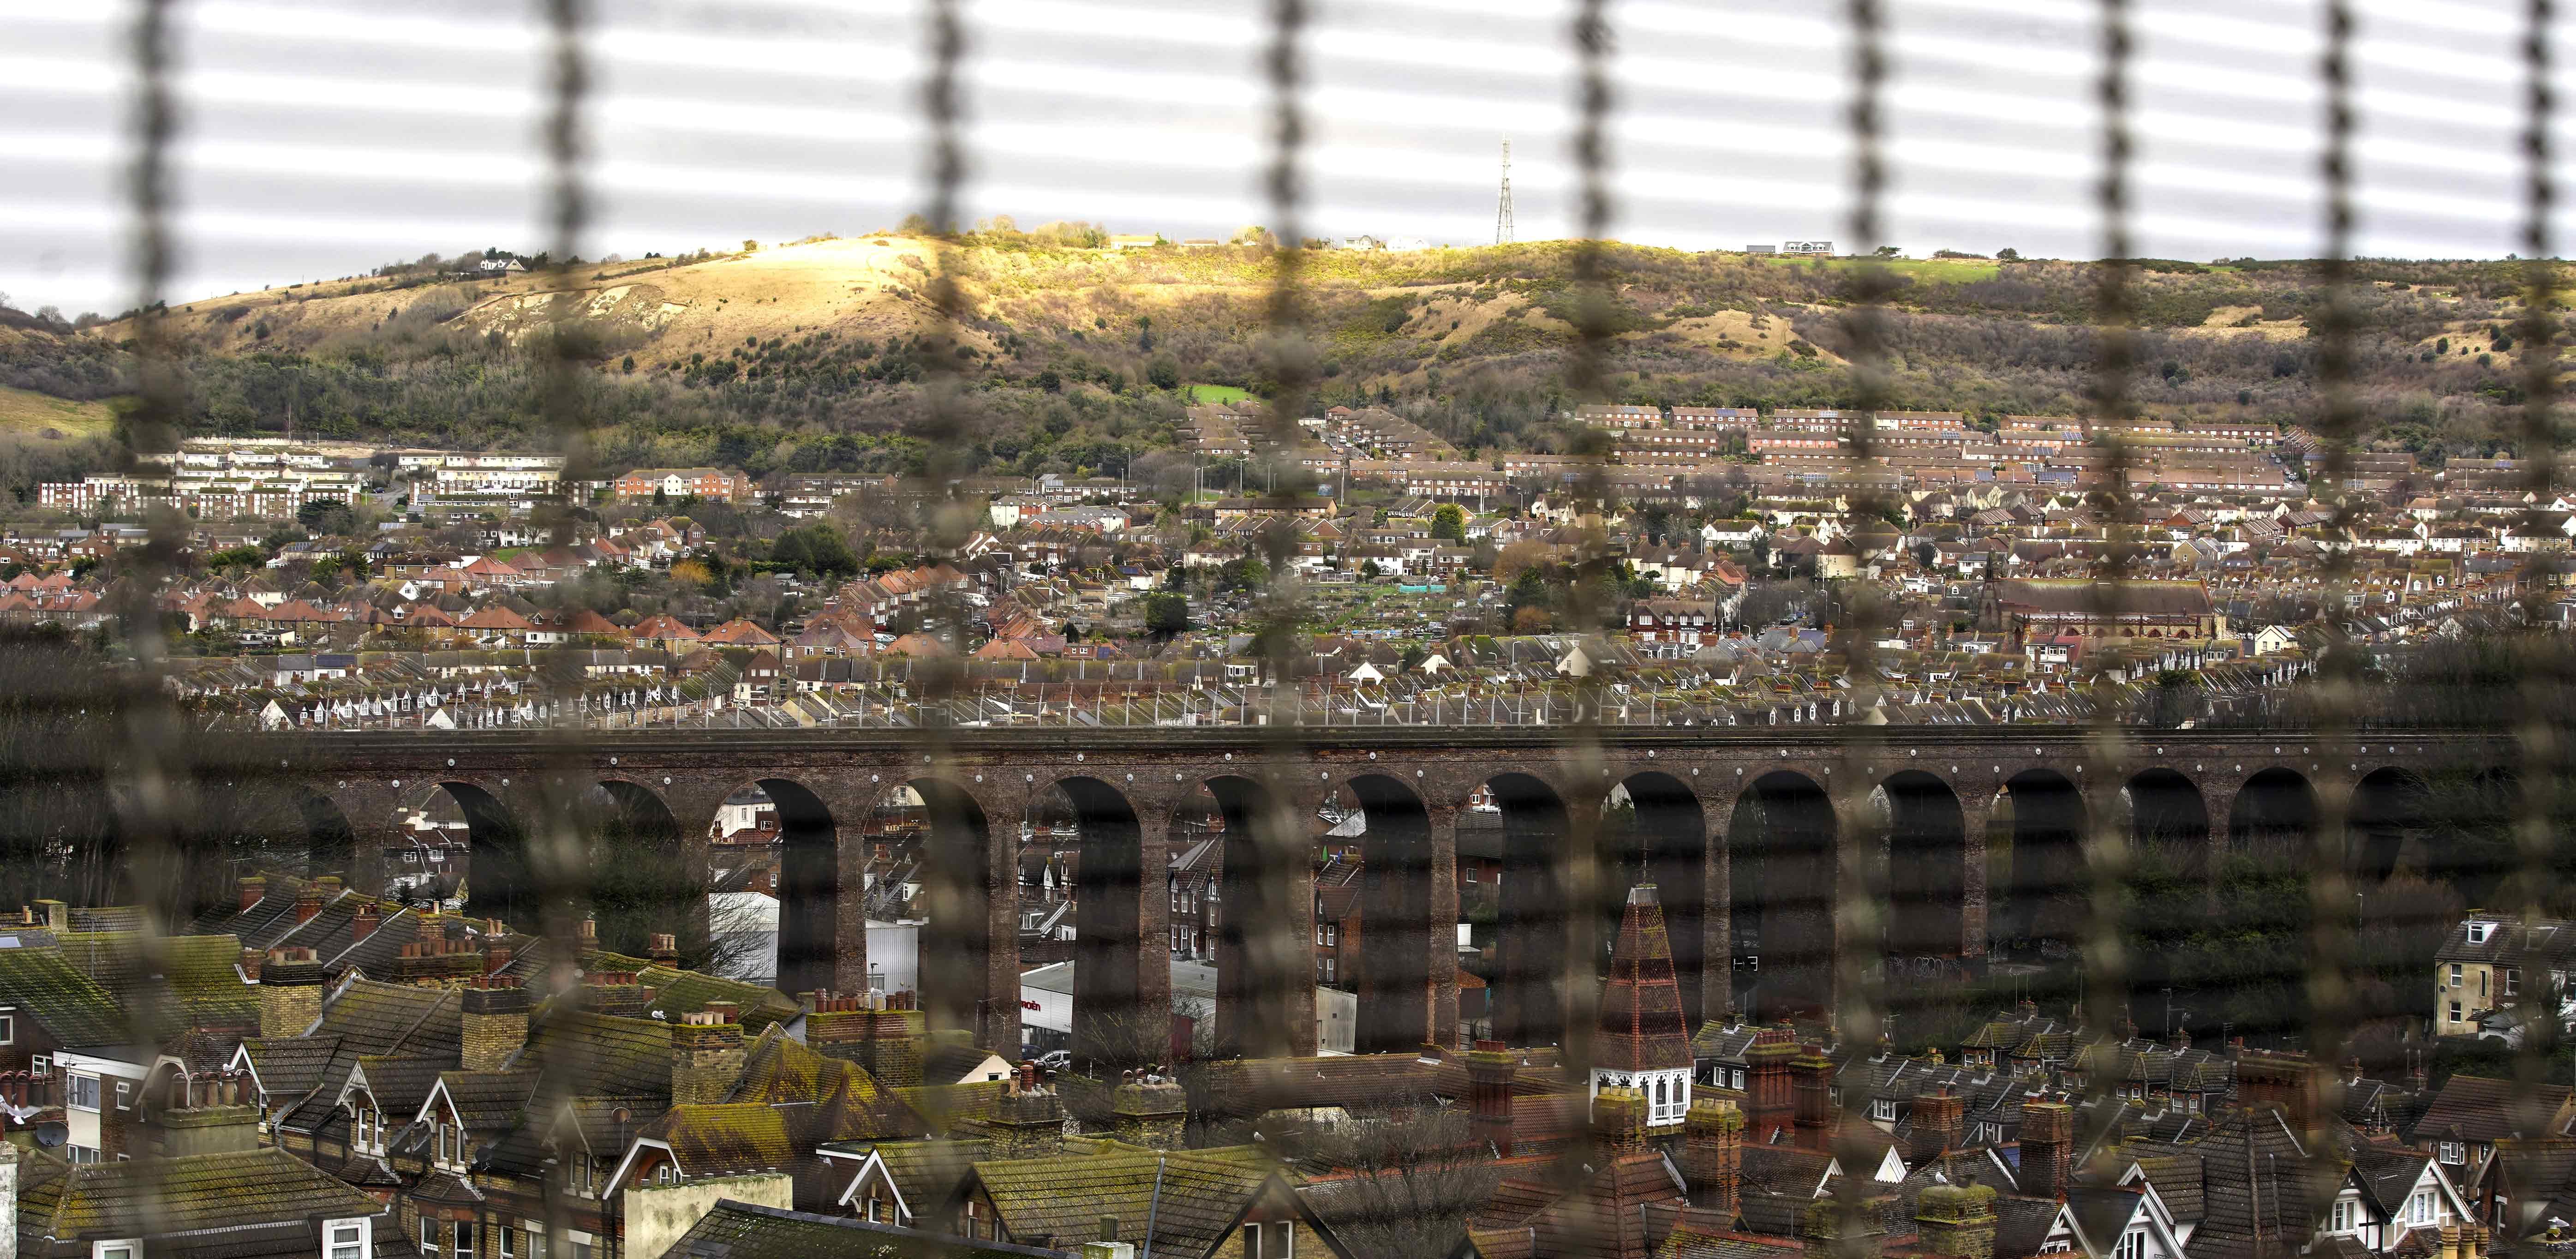 Railway Viaduct Dave Shackle Vista